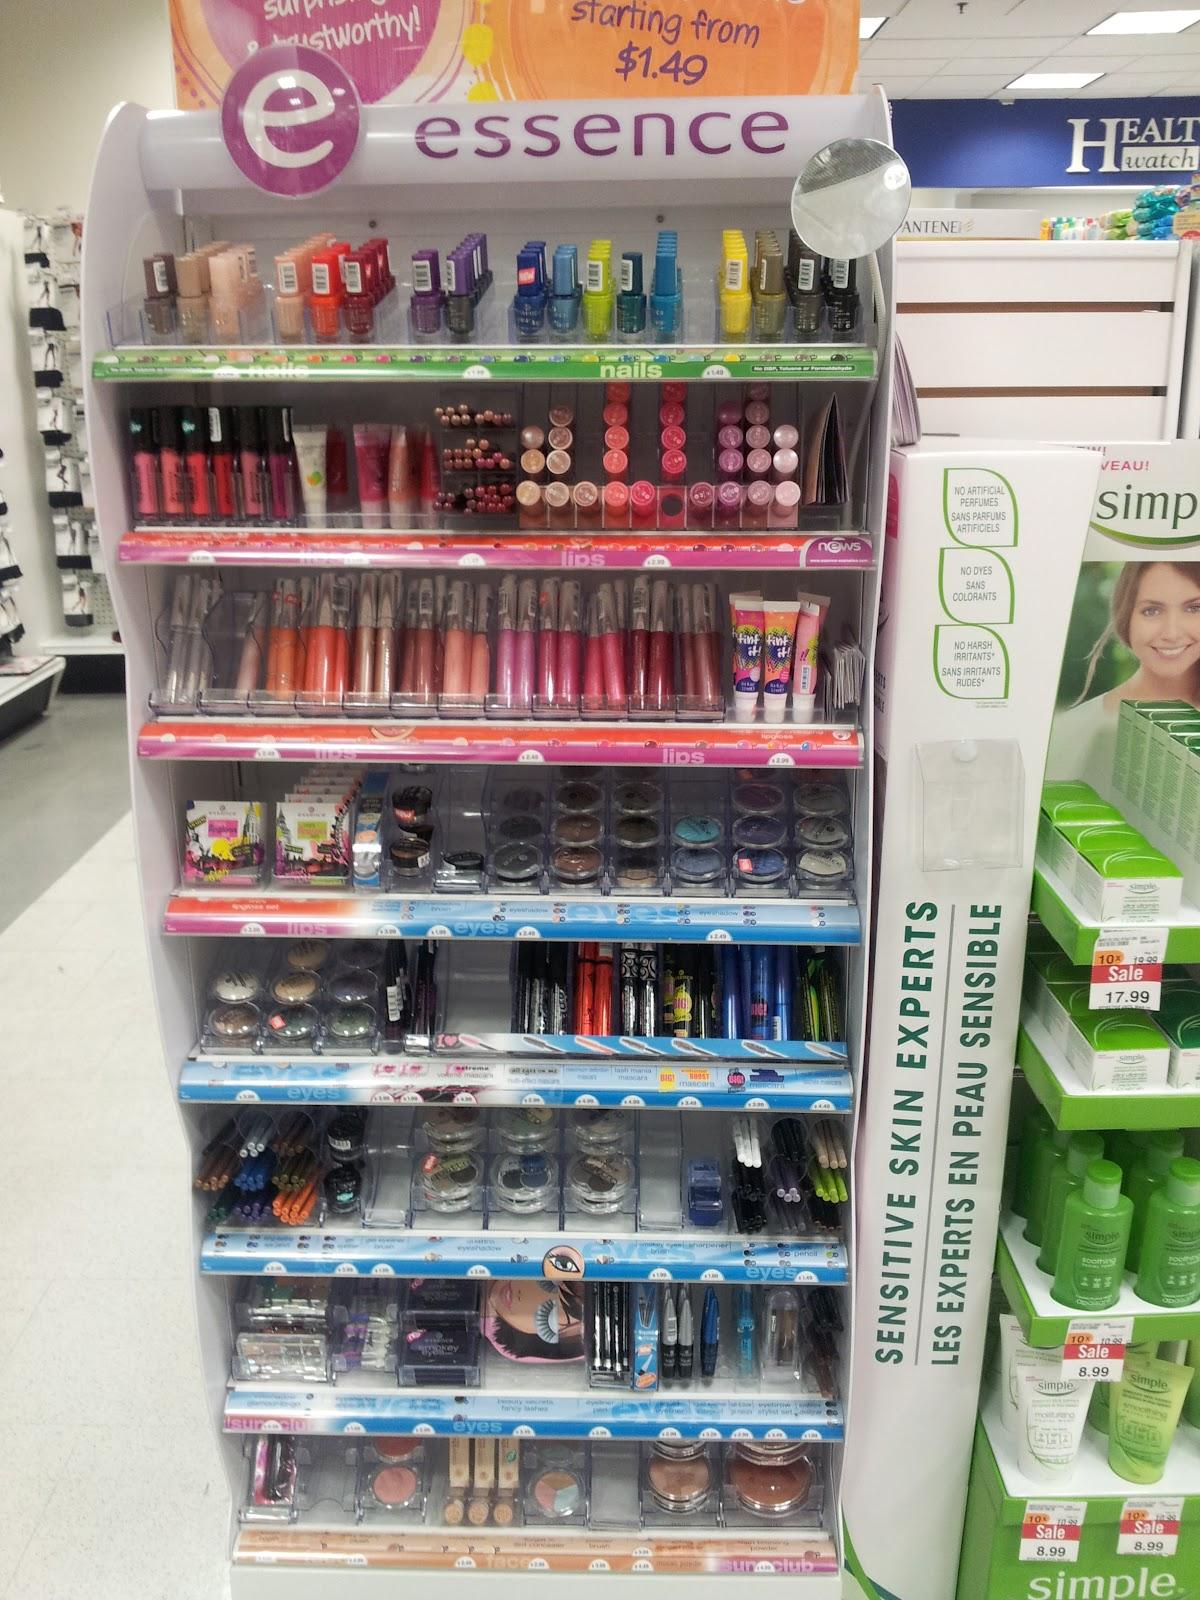 Lifestyle.Beauty.Fashion: New: Essence at Shoppers Drug Mart